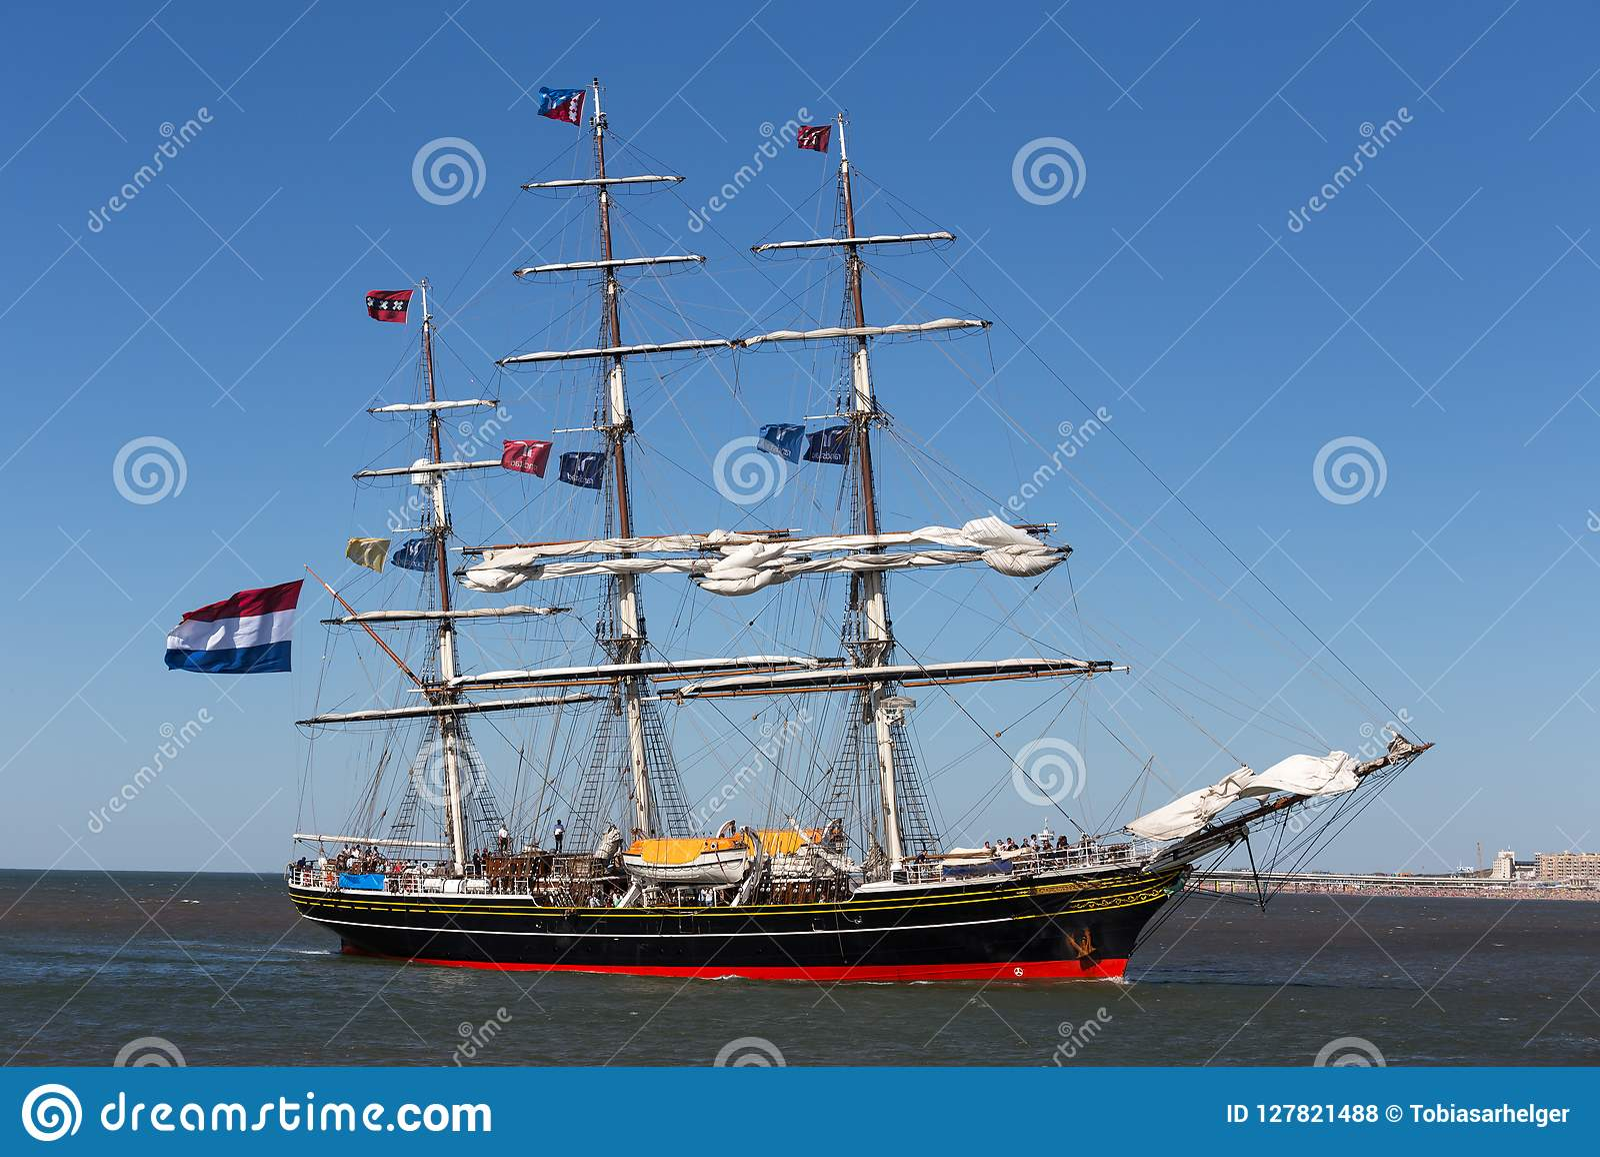 Hague Hague, holandie,/- 01 07 18: żeglowanie statku stado Amsterdam na oceanie Hague holandie